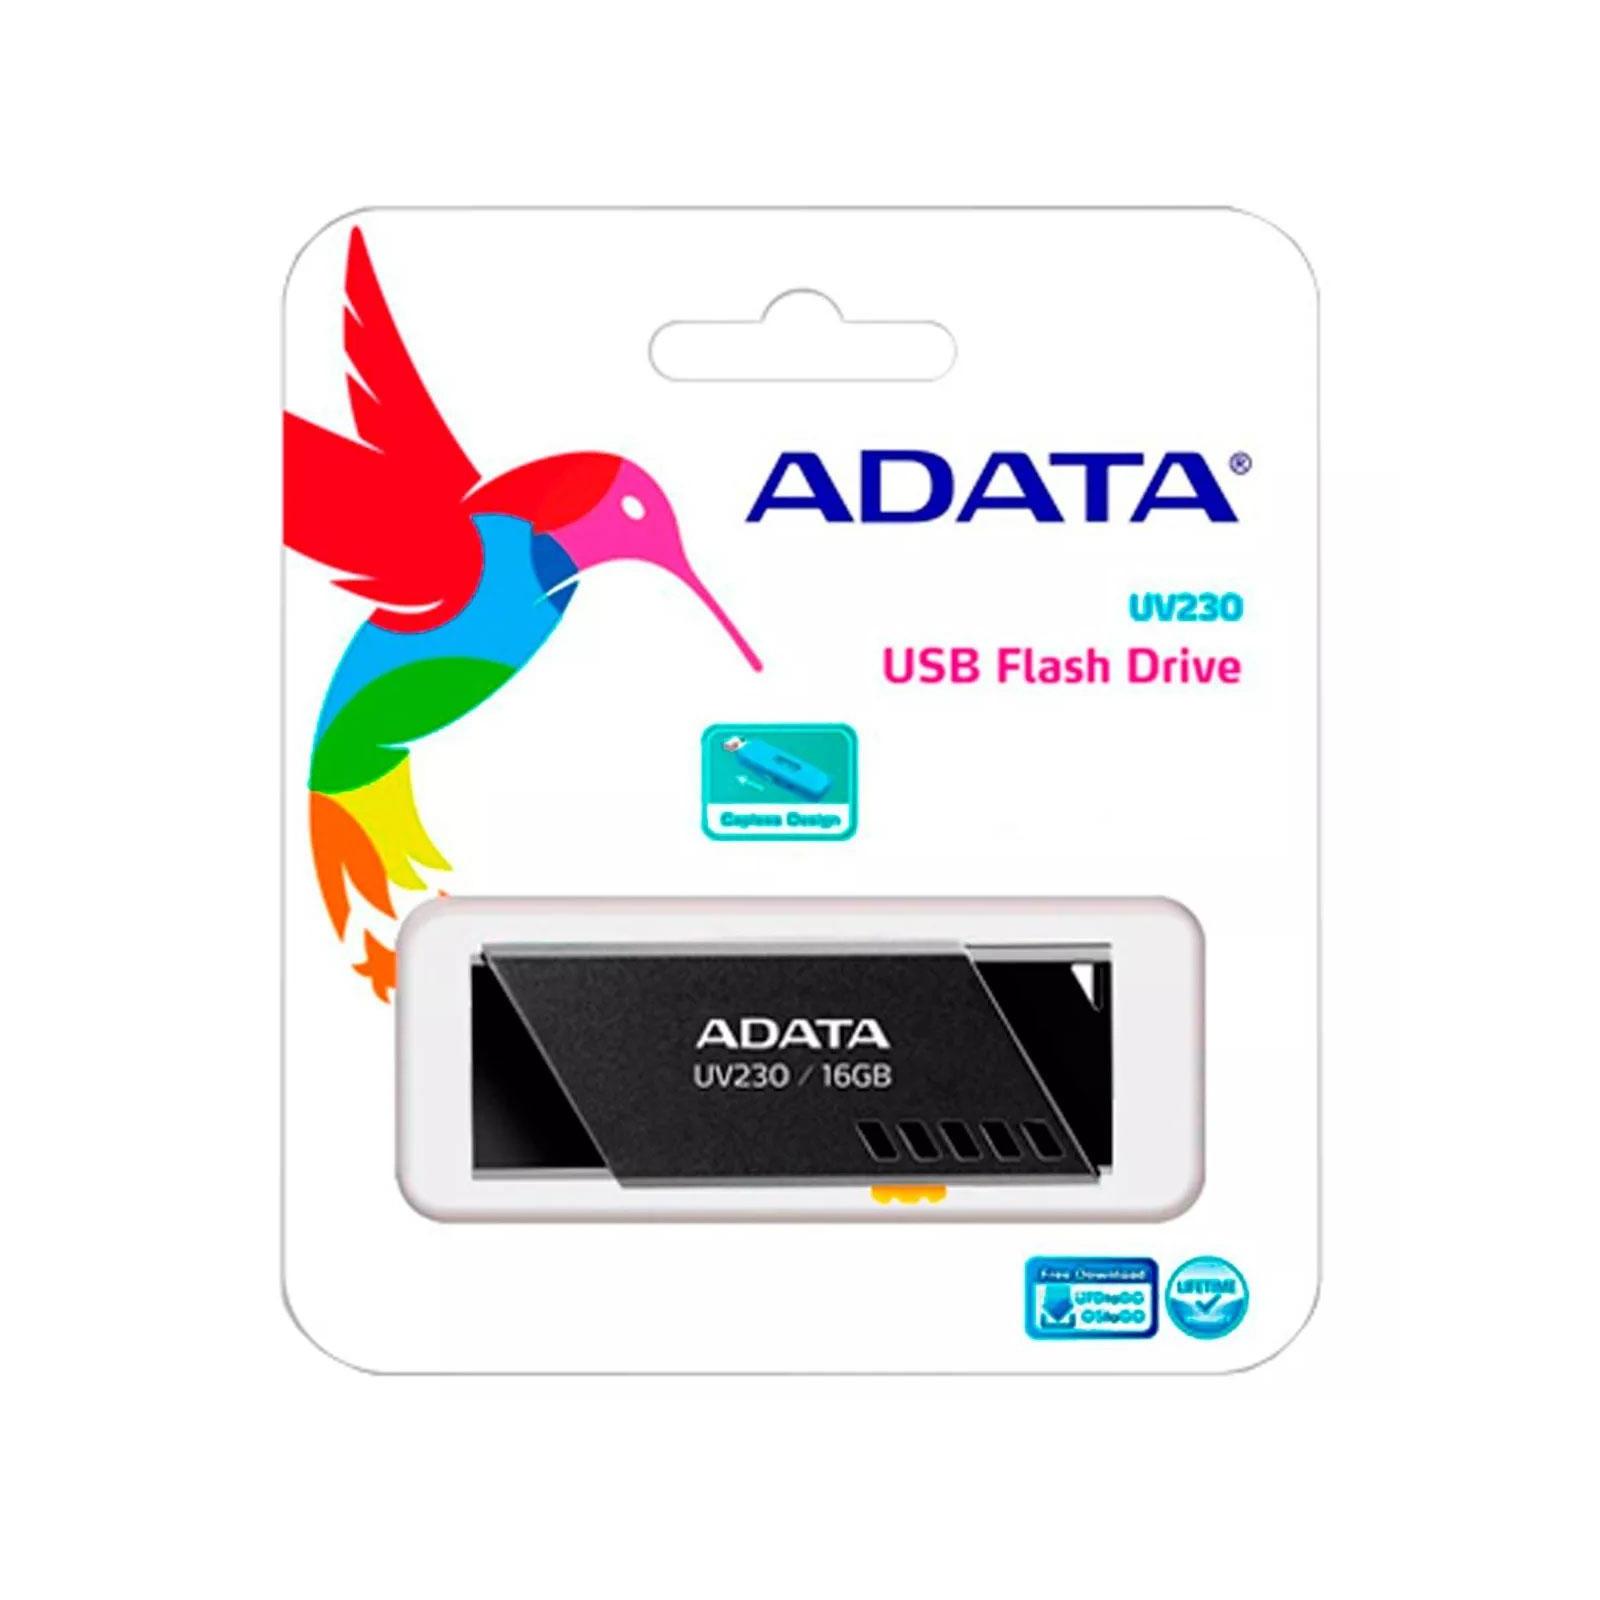 USB флеш накопитель ADATA 16GB UV230 Blue USB 2.0 (AUV230-16G-RBL) изображение 3